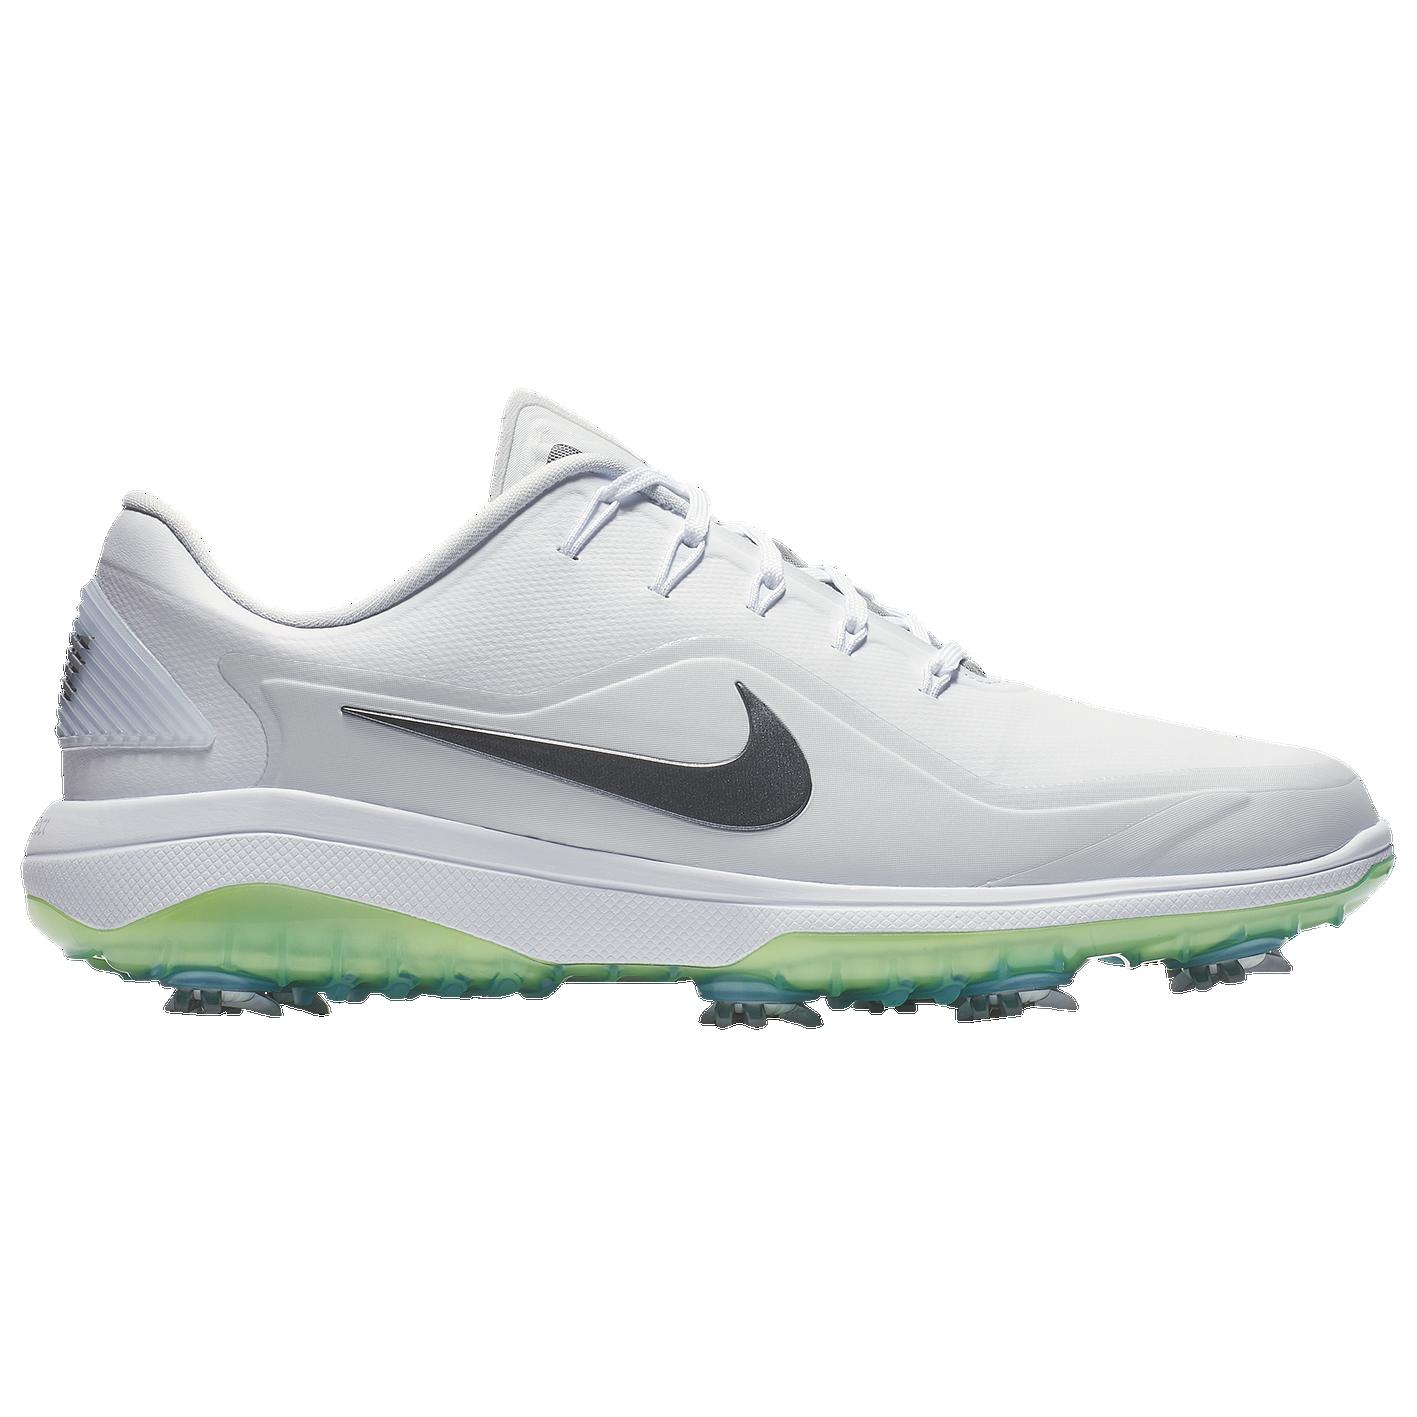 Nike React Vapor 2 Golf Shoes - Men s - Golf - Shoes - White Medium ... 77f288154